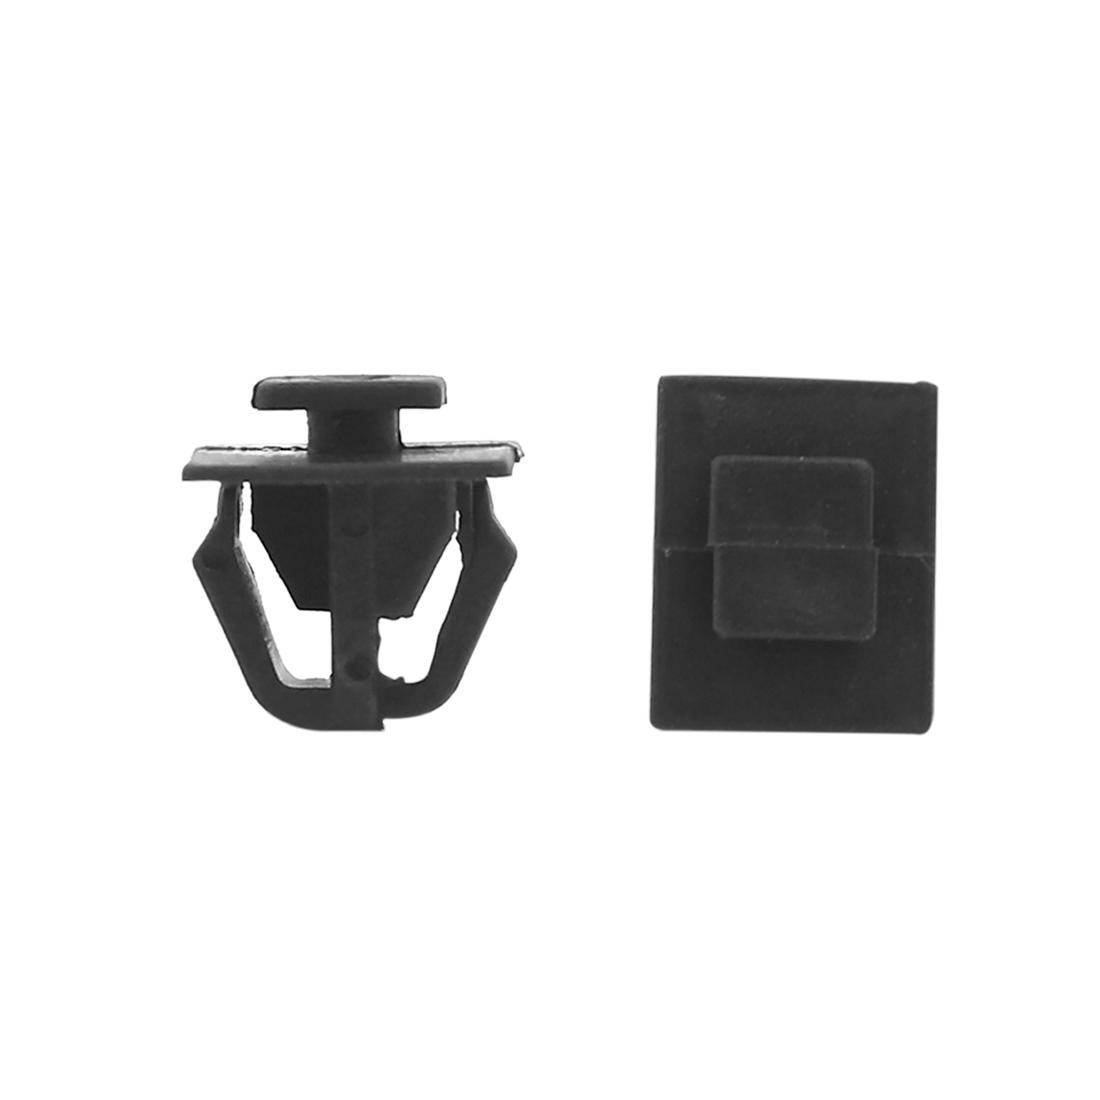 50Pcs 12mm Hole Dia Plastic Rivets Fastener Push Clips Black for Car Auto Fender